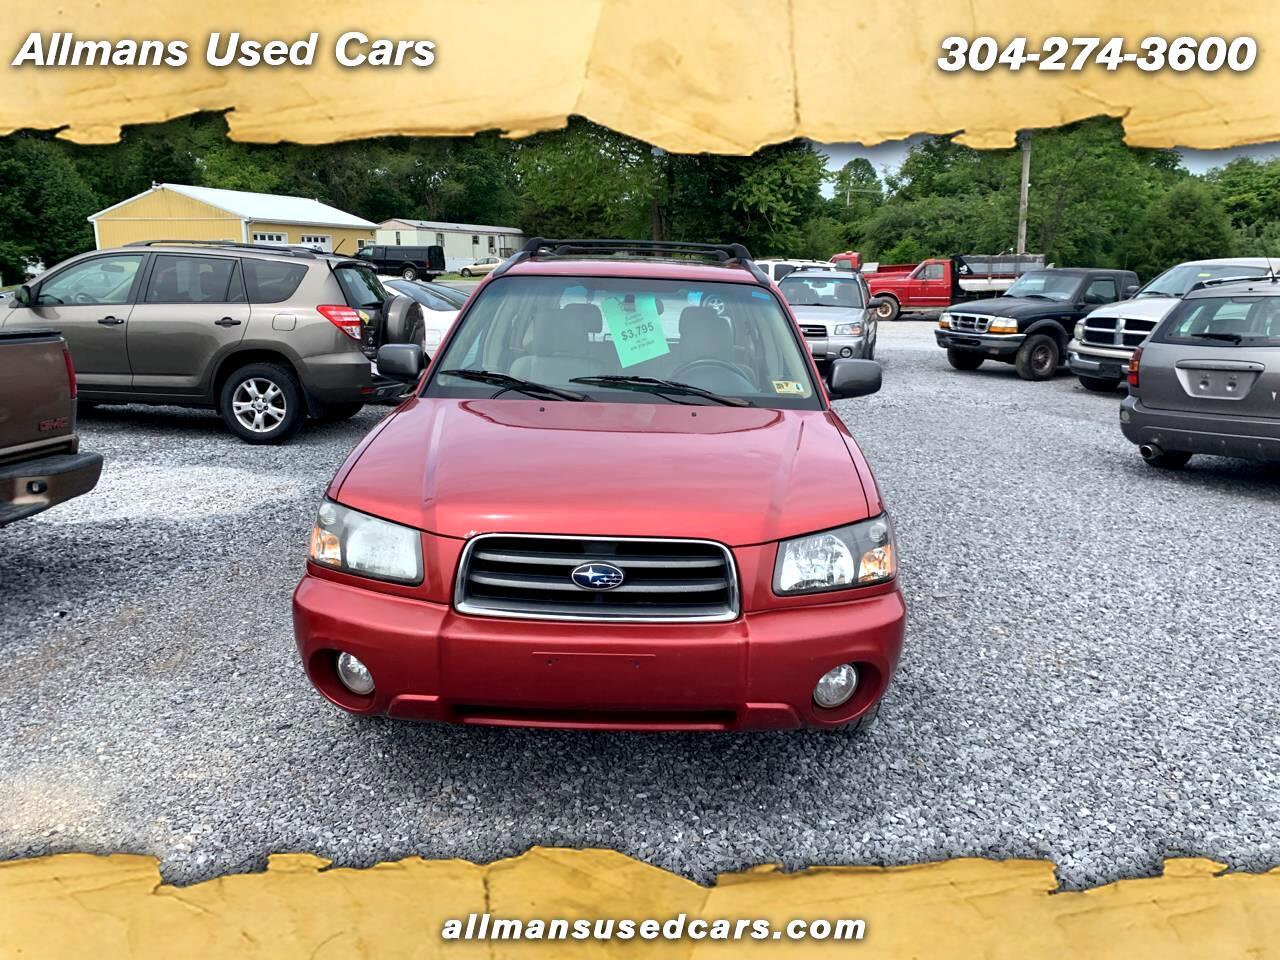 2003 Subaru Forester 2.5 XS